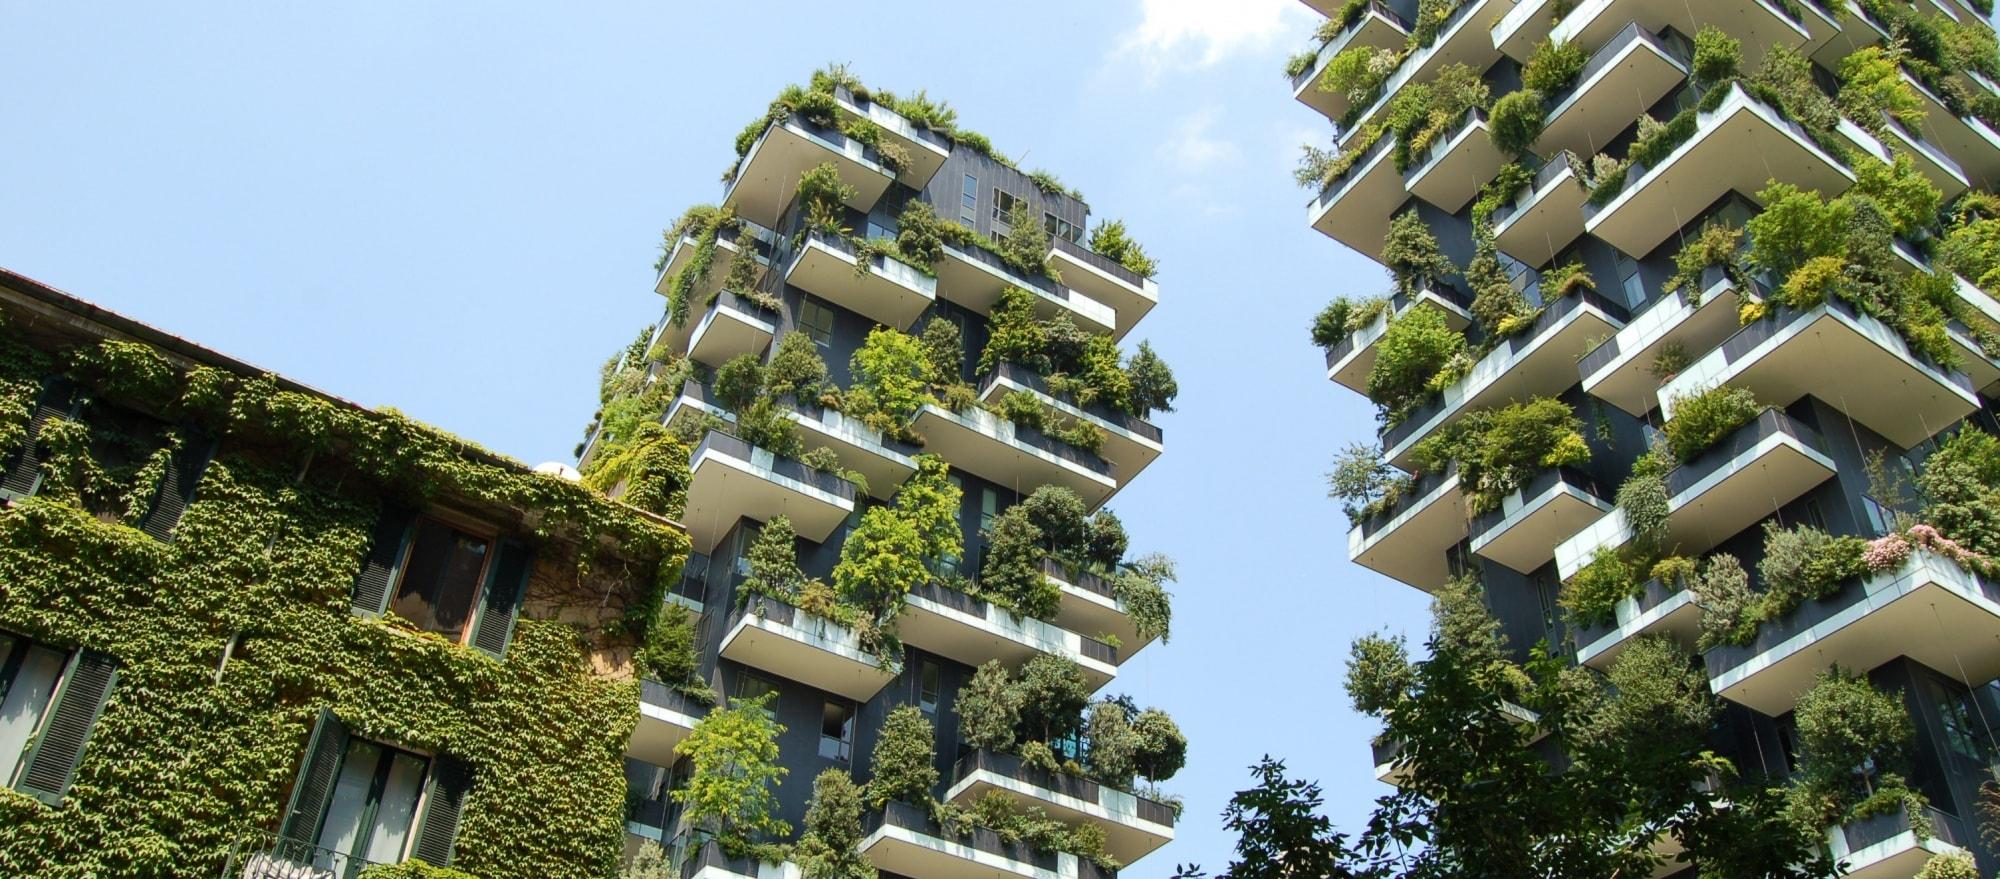 ventajas-beneficios-fachadas-verdes-edificios